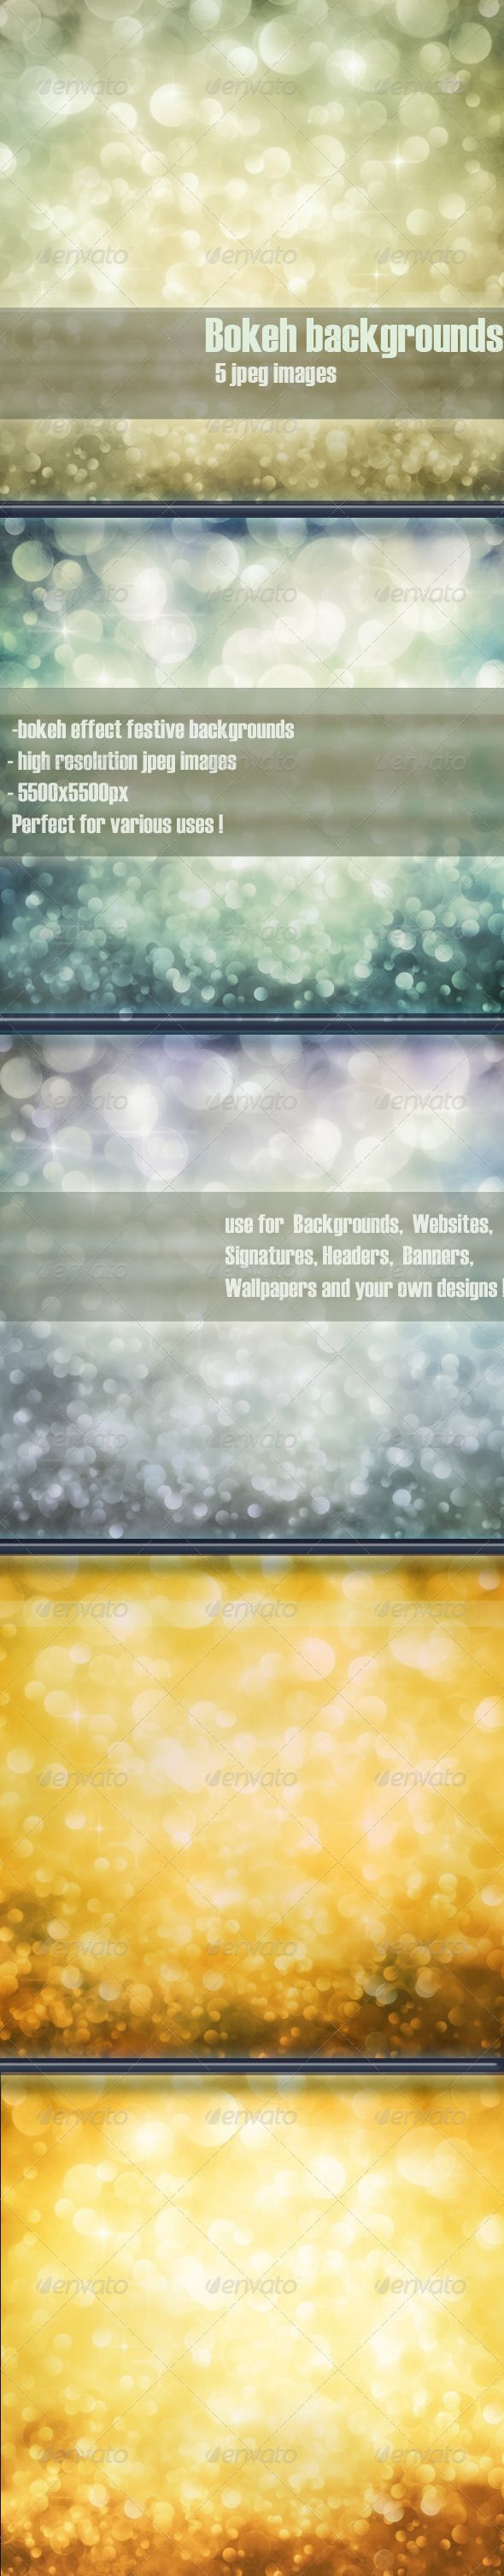 Festive bokeh backgrounds vol.3 — JPG Image #banner #blurred • Available here → https://graphicriver.net/item/festive-bokeh-backgrounds-vol3/1081253?ref=pxcr